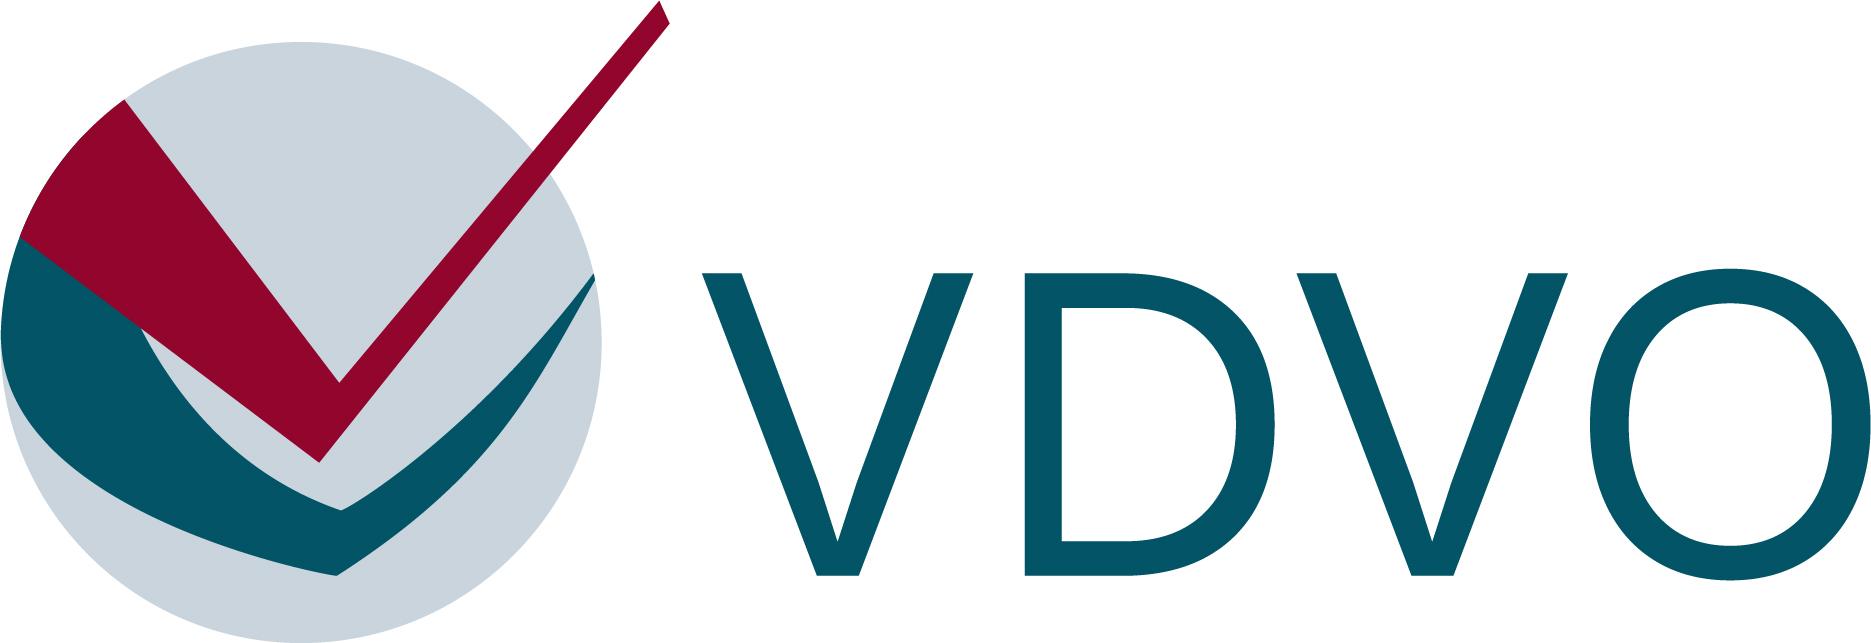 VDVO - Verband der Veranstaltungsorganisatoren e.V.